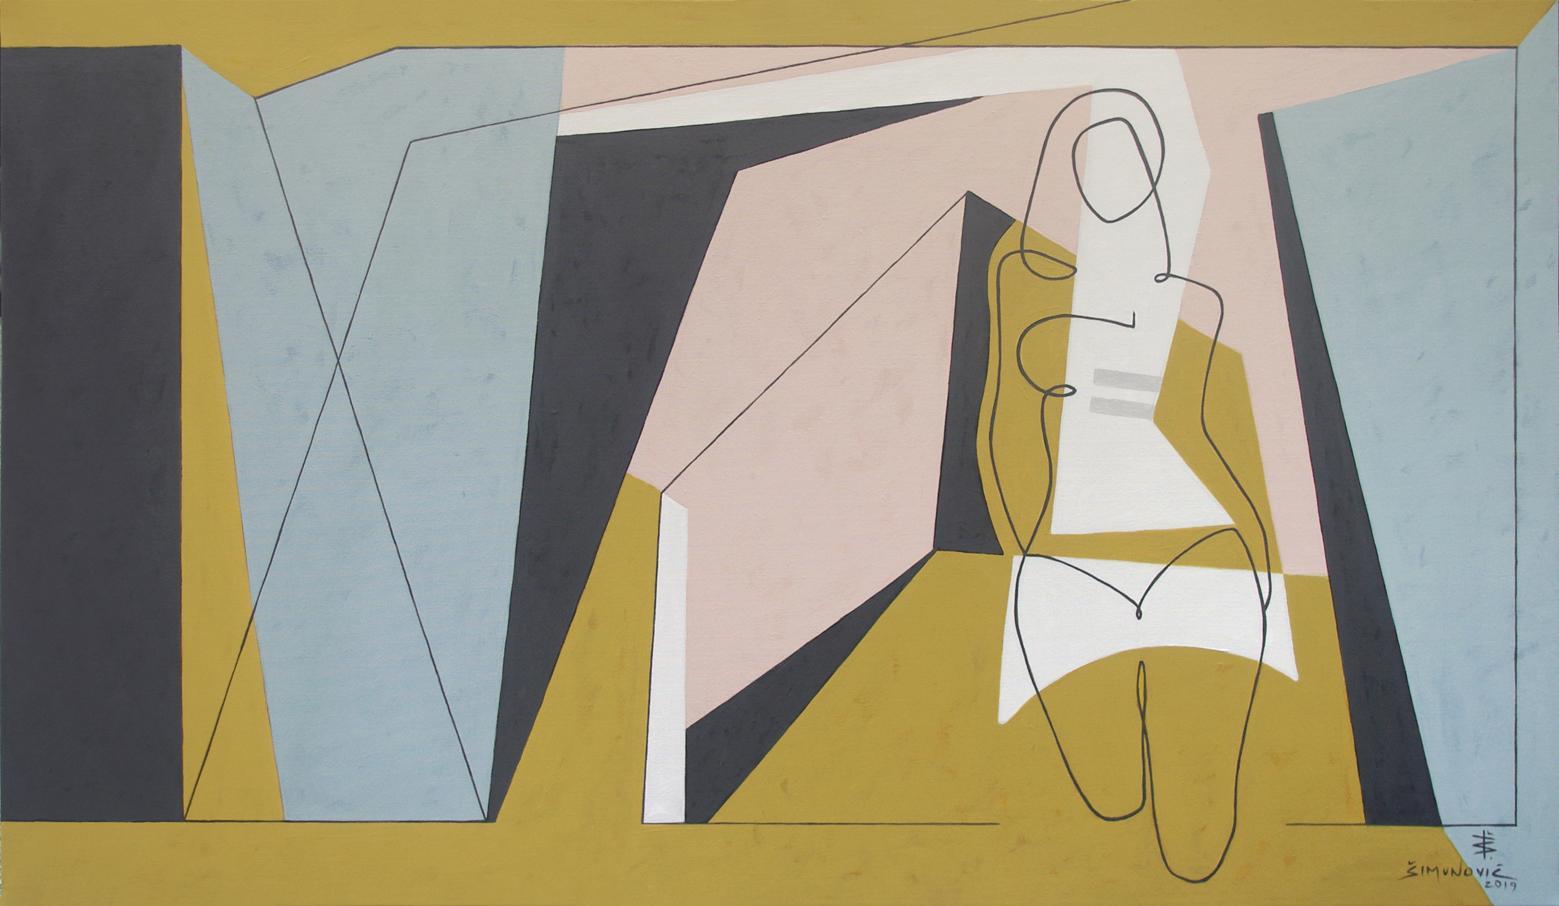 Runway, Modern Abstract Wall Art Geometric Painting Canvas Pattern Yellow Blue